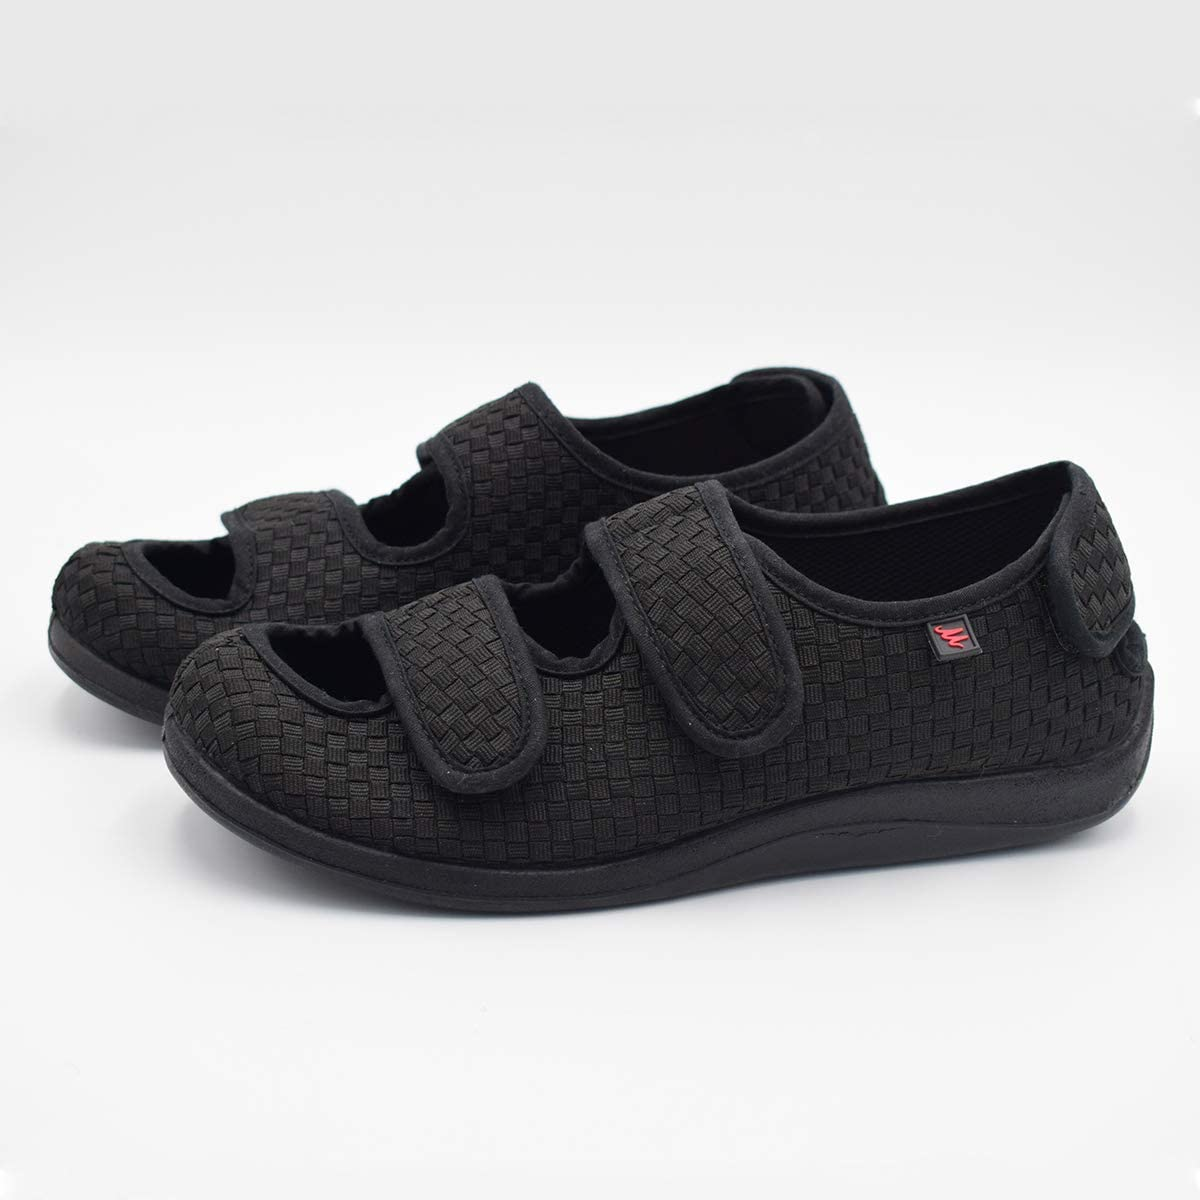 8 , Black Mei MACLEOD Womens Diabetic Extra Wide Slippers Adjustable Edama Shoes Women